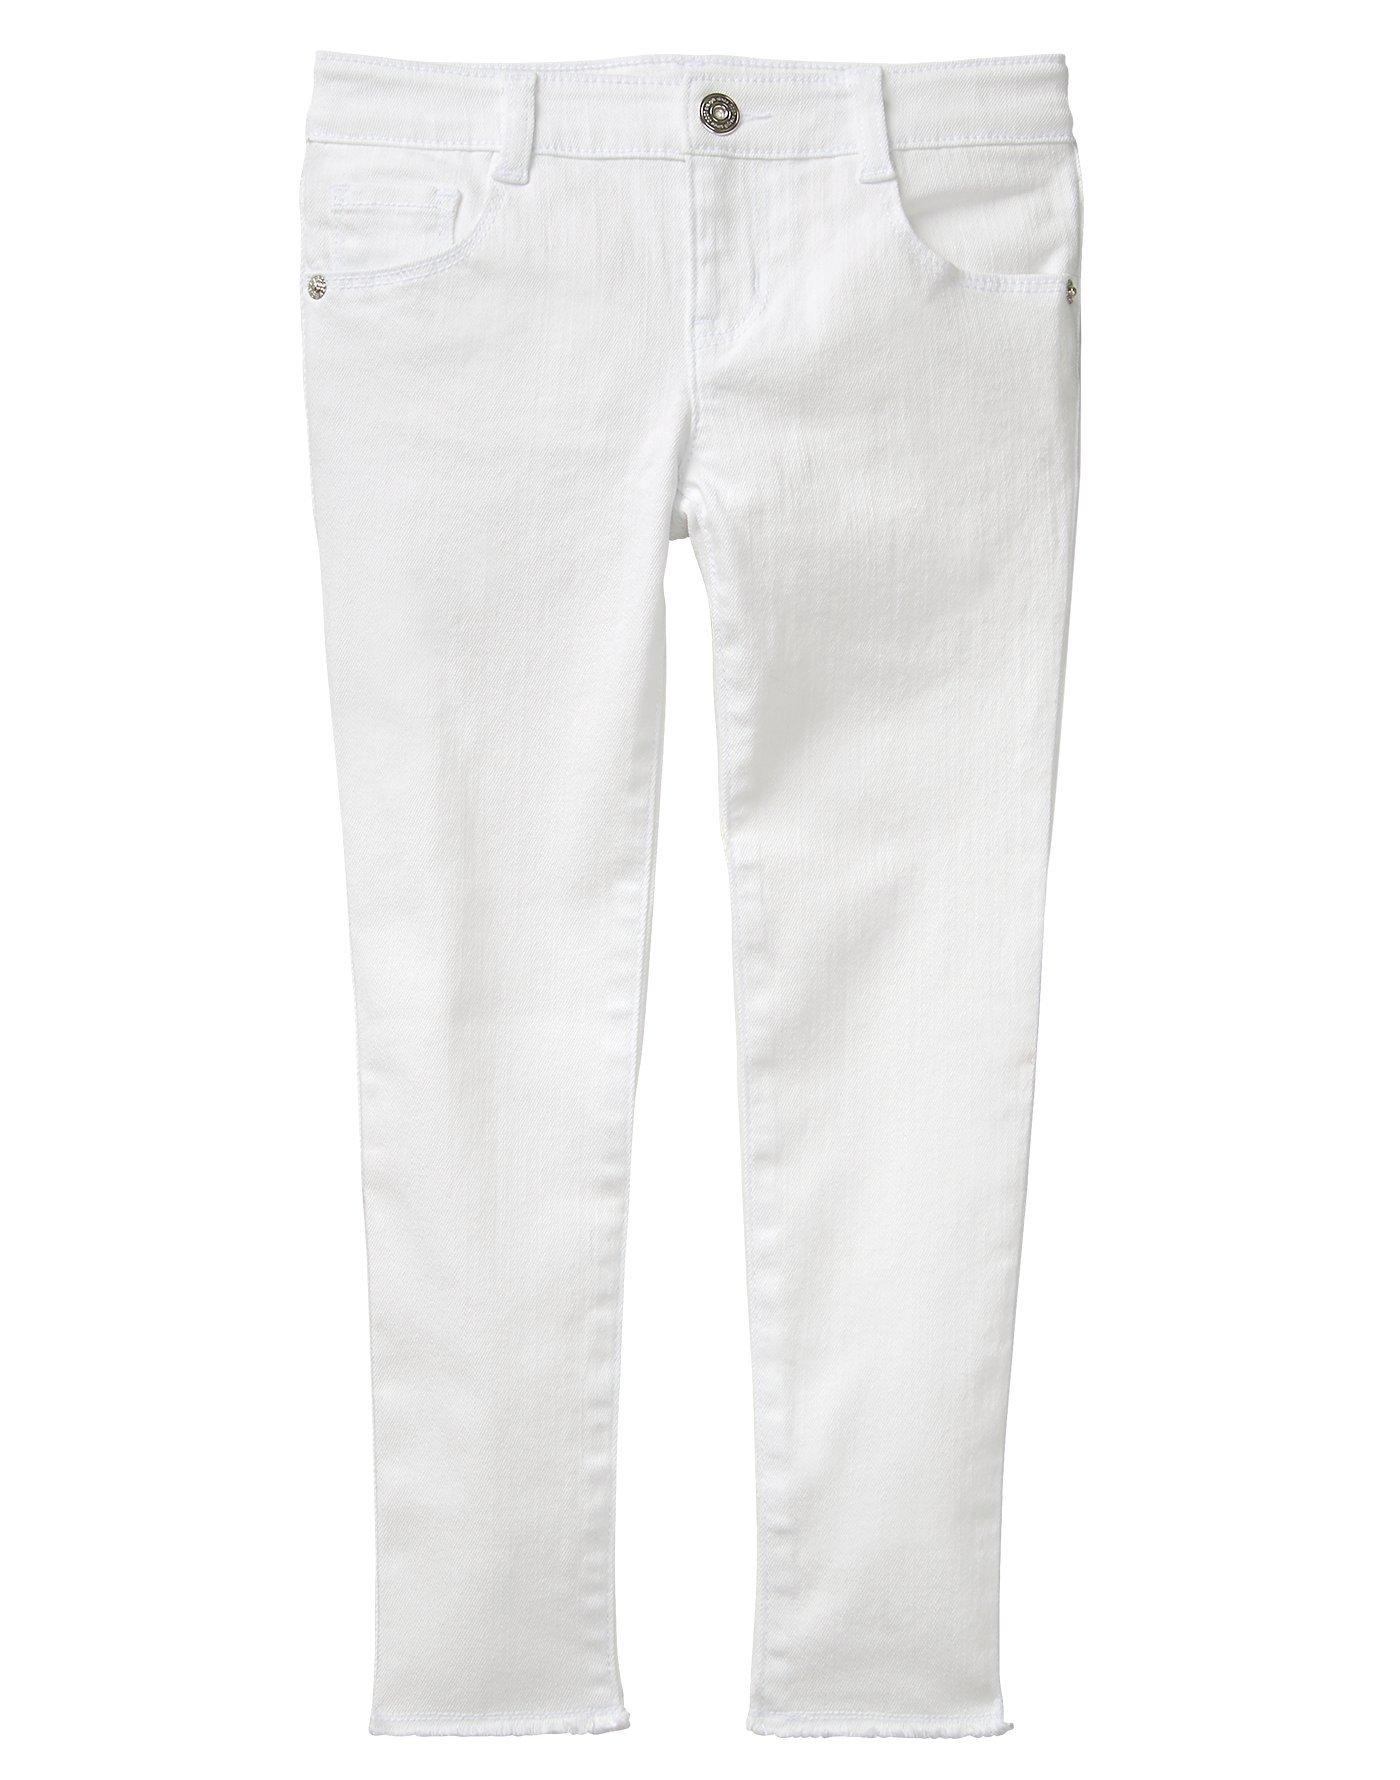 Crazy 8 Little Girls' Raw Hem Skinny Jean, White, 5